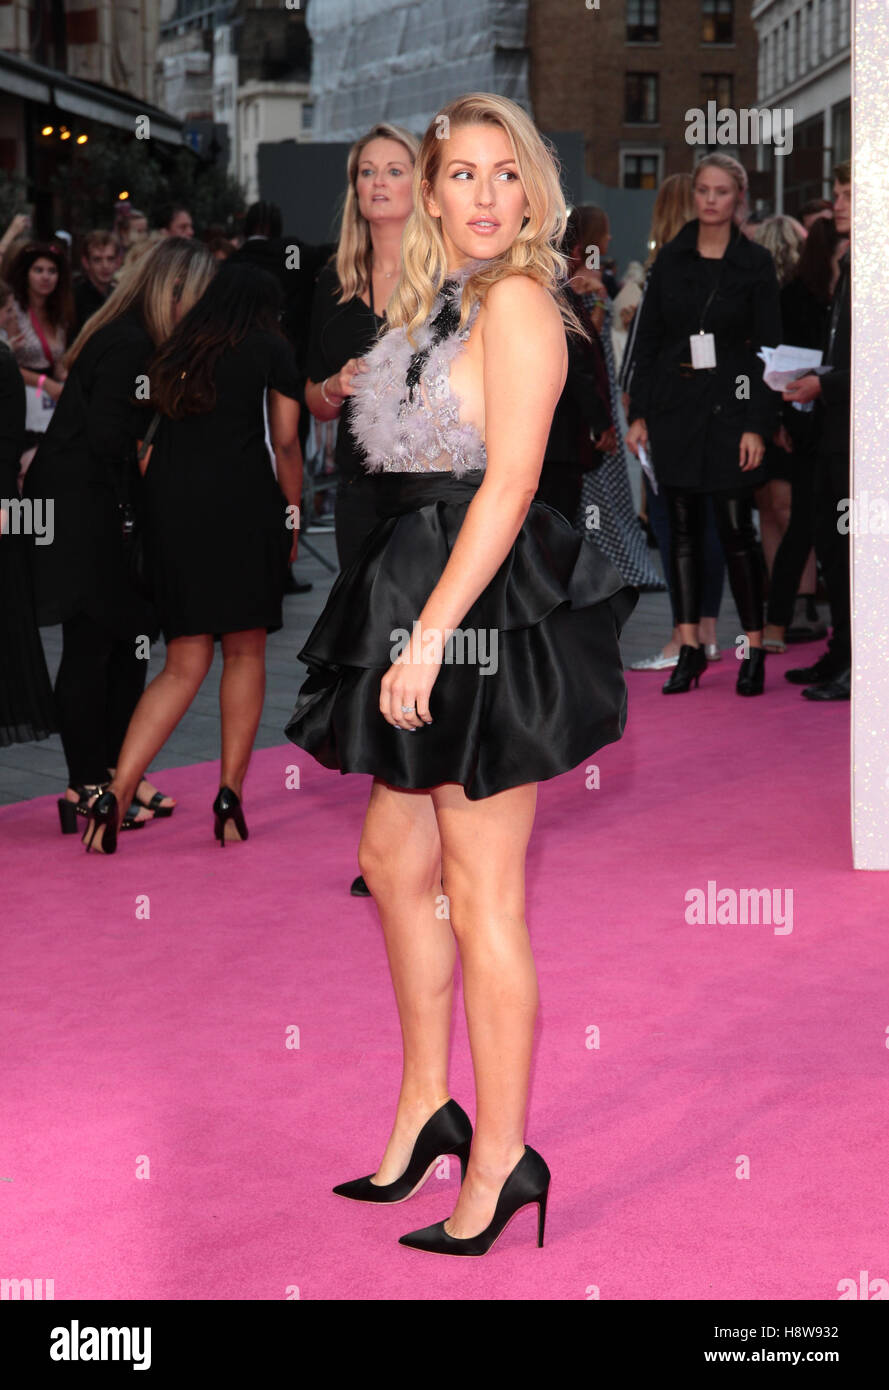 Ellie Goulding attends Bridget Jone's Baby film premiere London on 05 Sep, 2016 - Stock Image